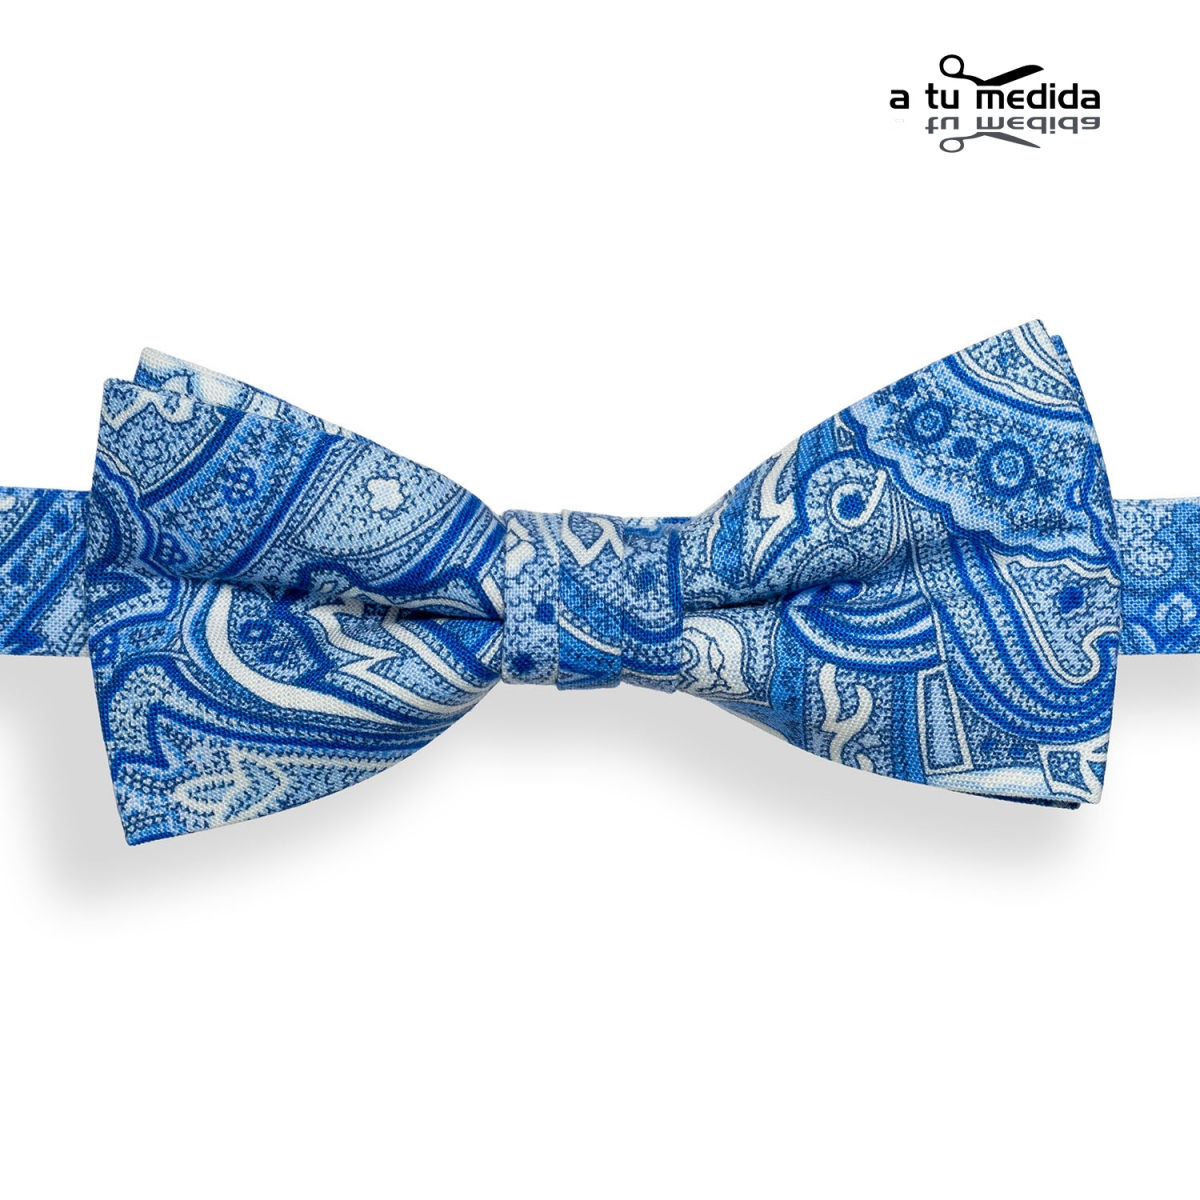 Pajarita-Azul-Cachemir-con-Dibujos-en-Azul